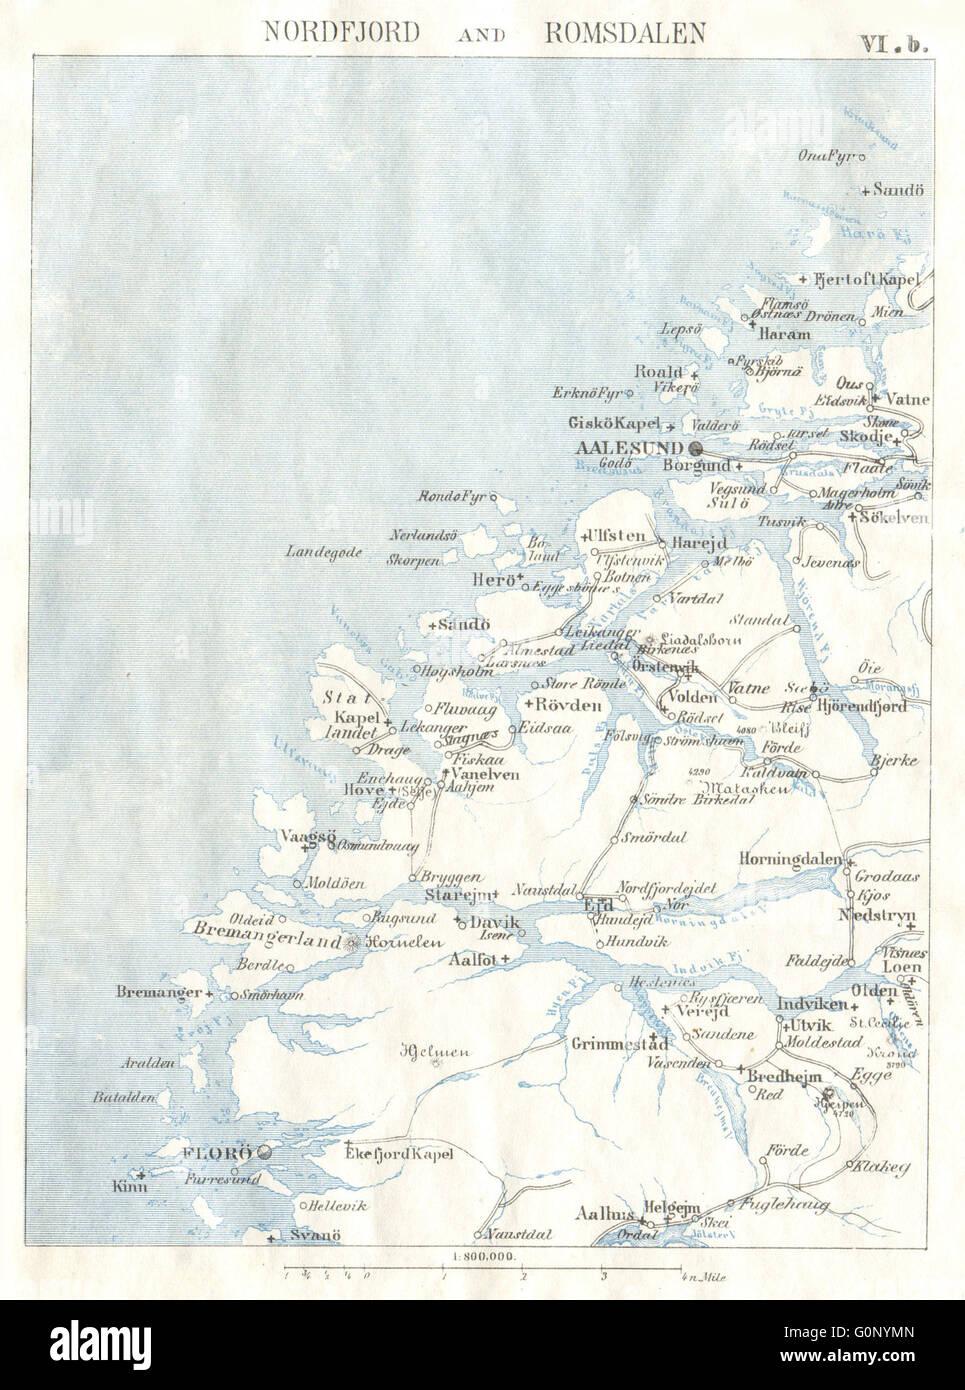 NORWAY Nordfjord Romsdalen Alesund Floro 1896 antique map